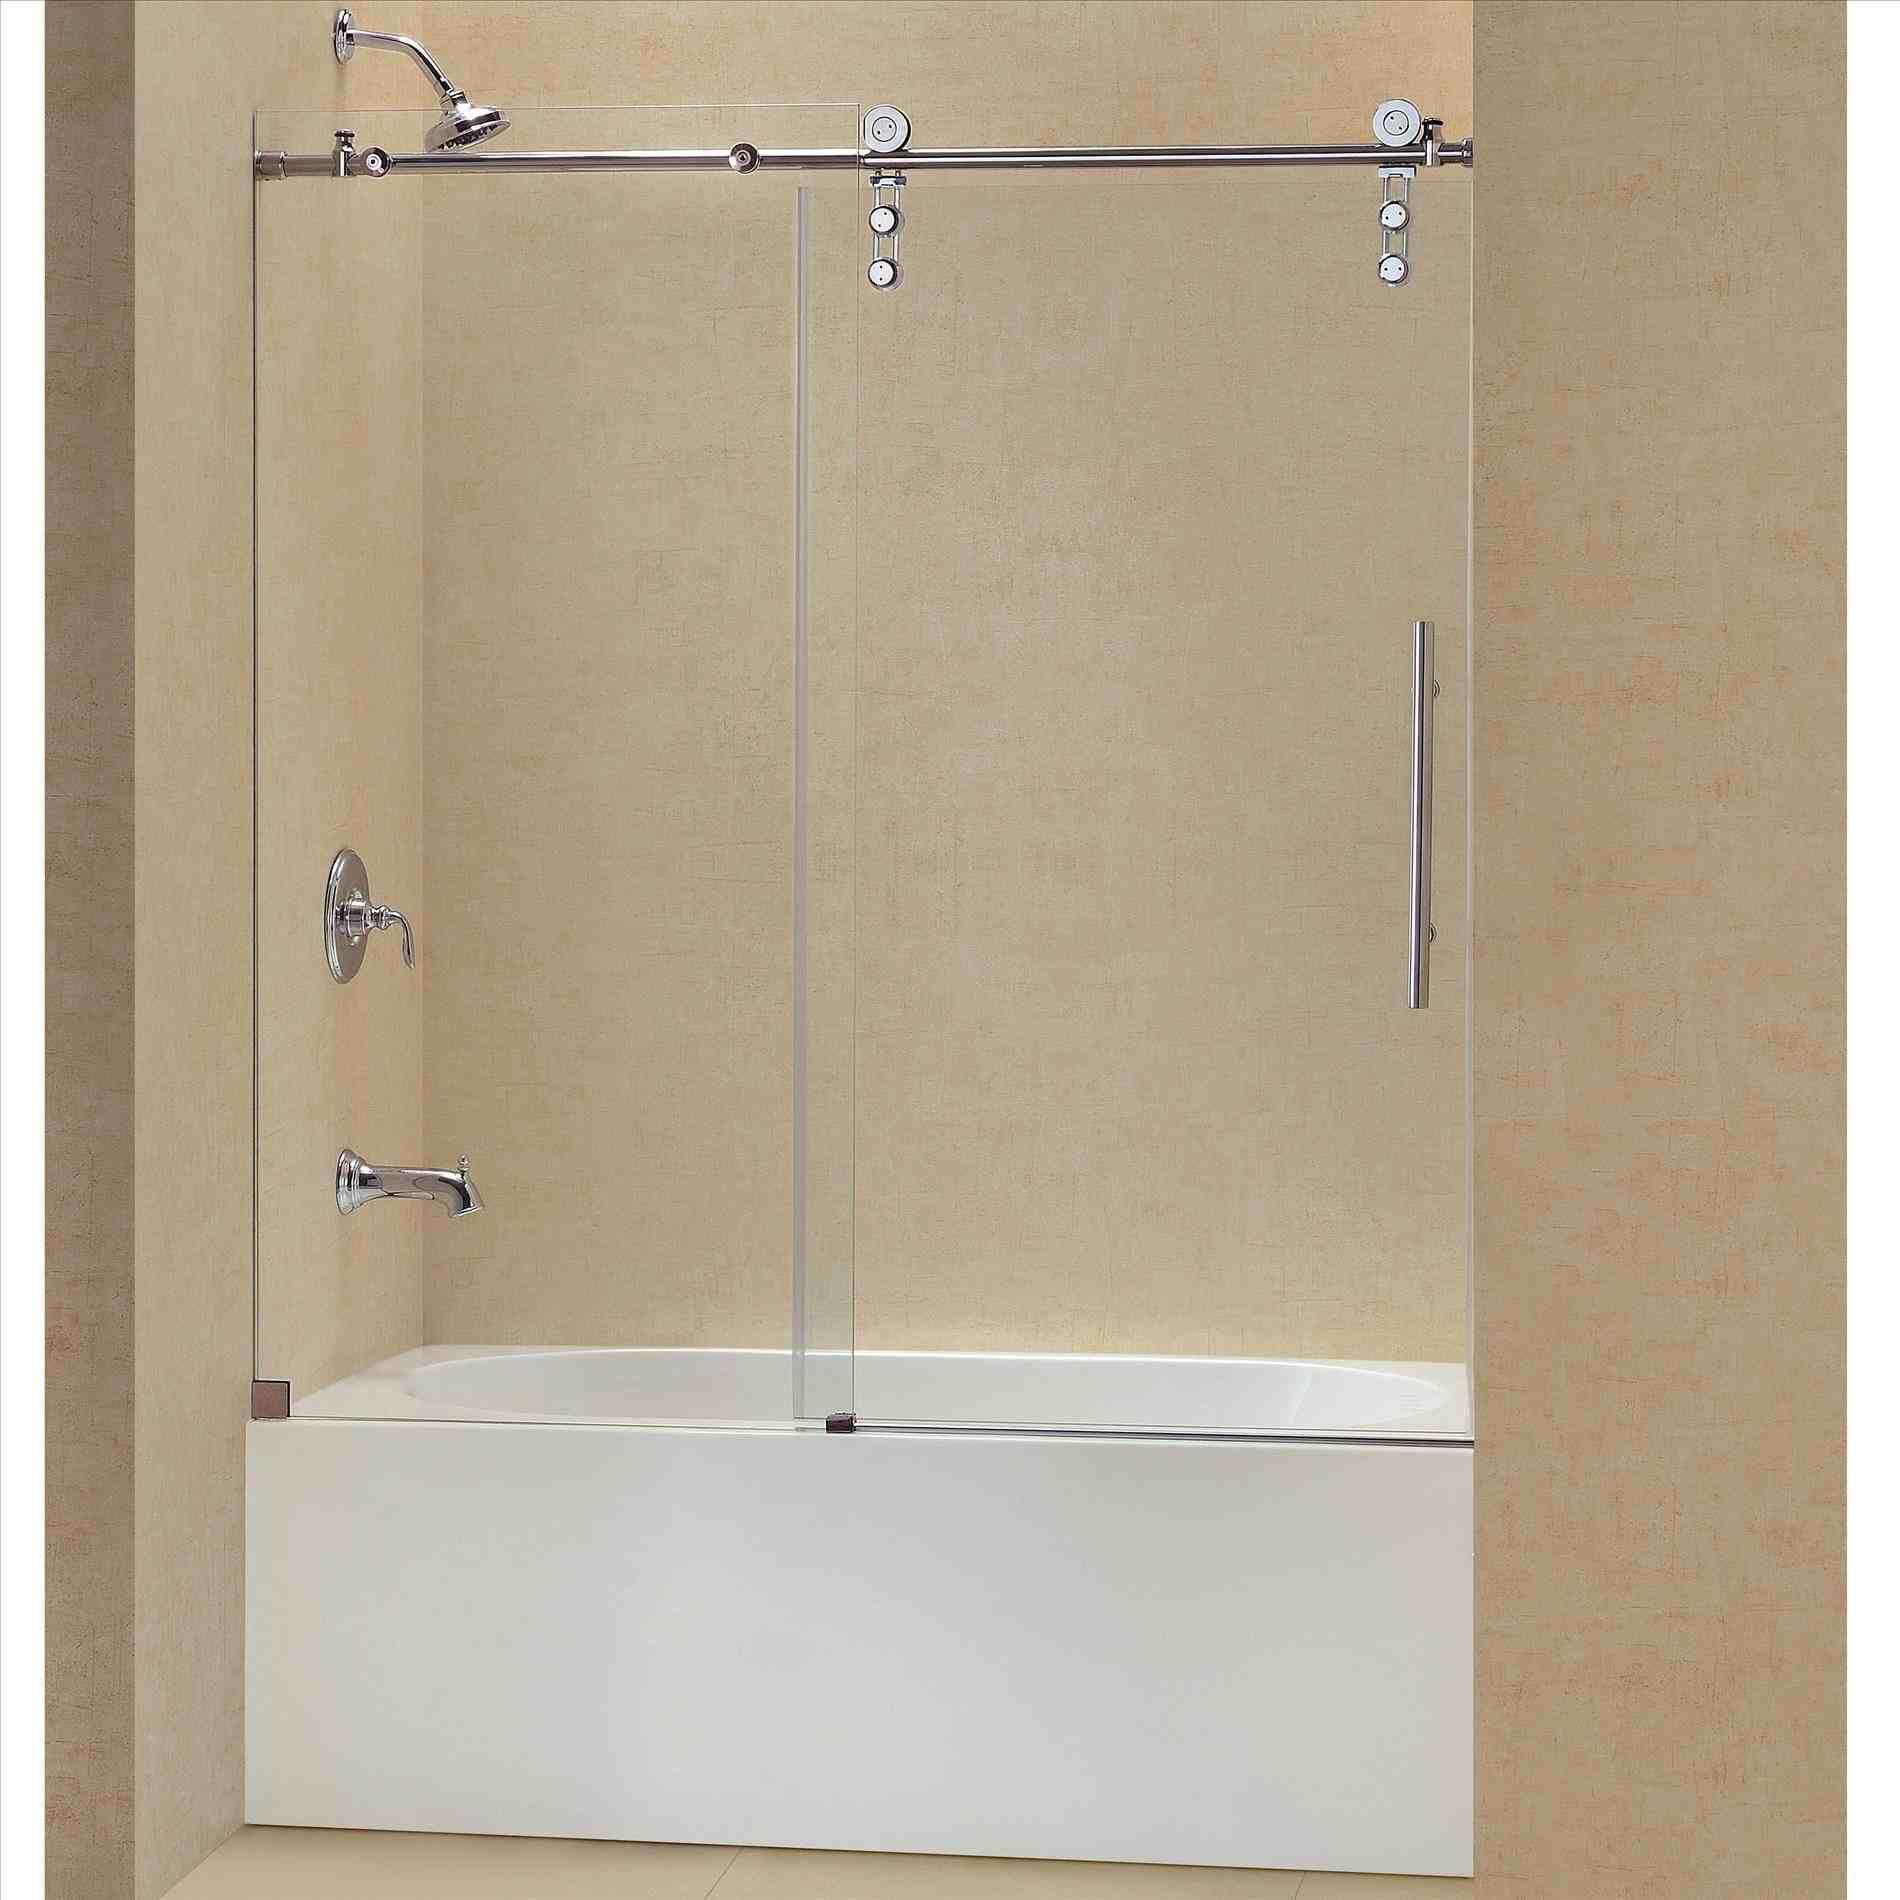 This Bathroom Tubs With Glass Doors Bathroom Bathtubs Style